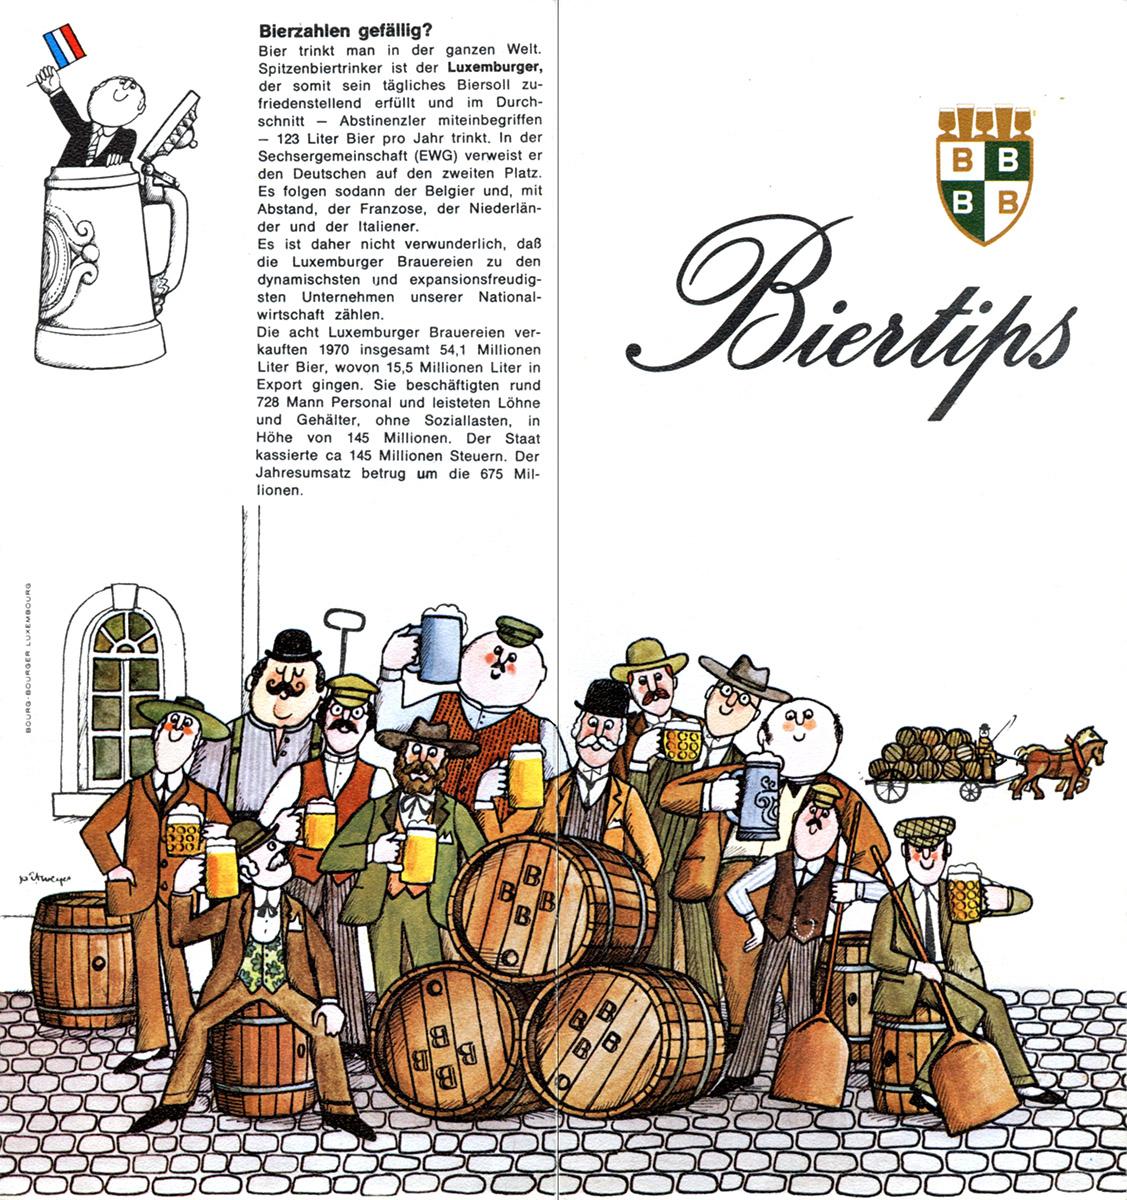 Flyer Bofferding 1973 Luxembourg illustrations Pit Weyer